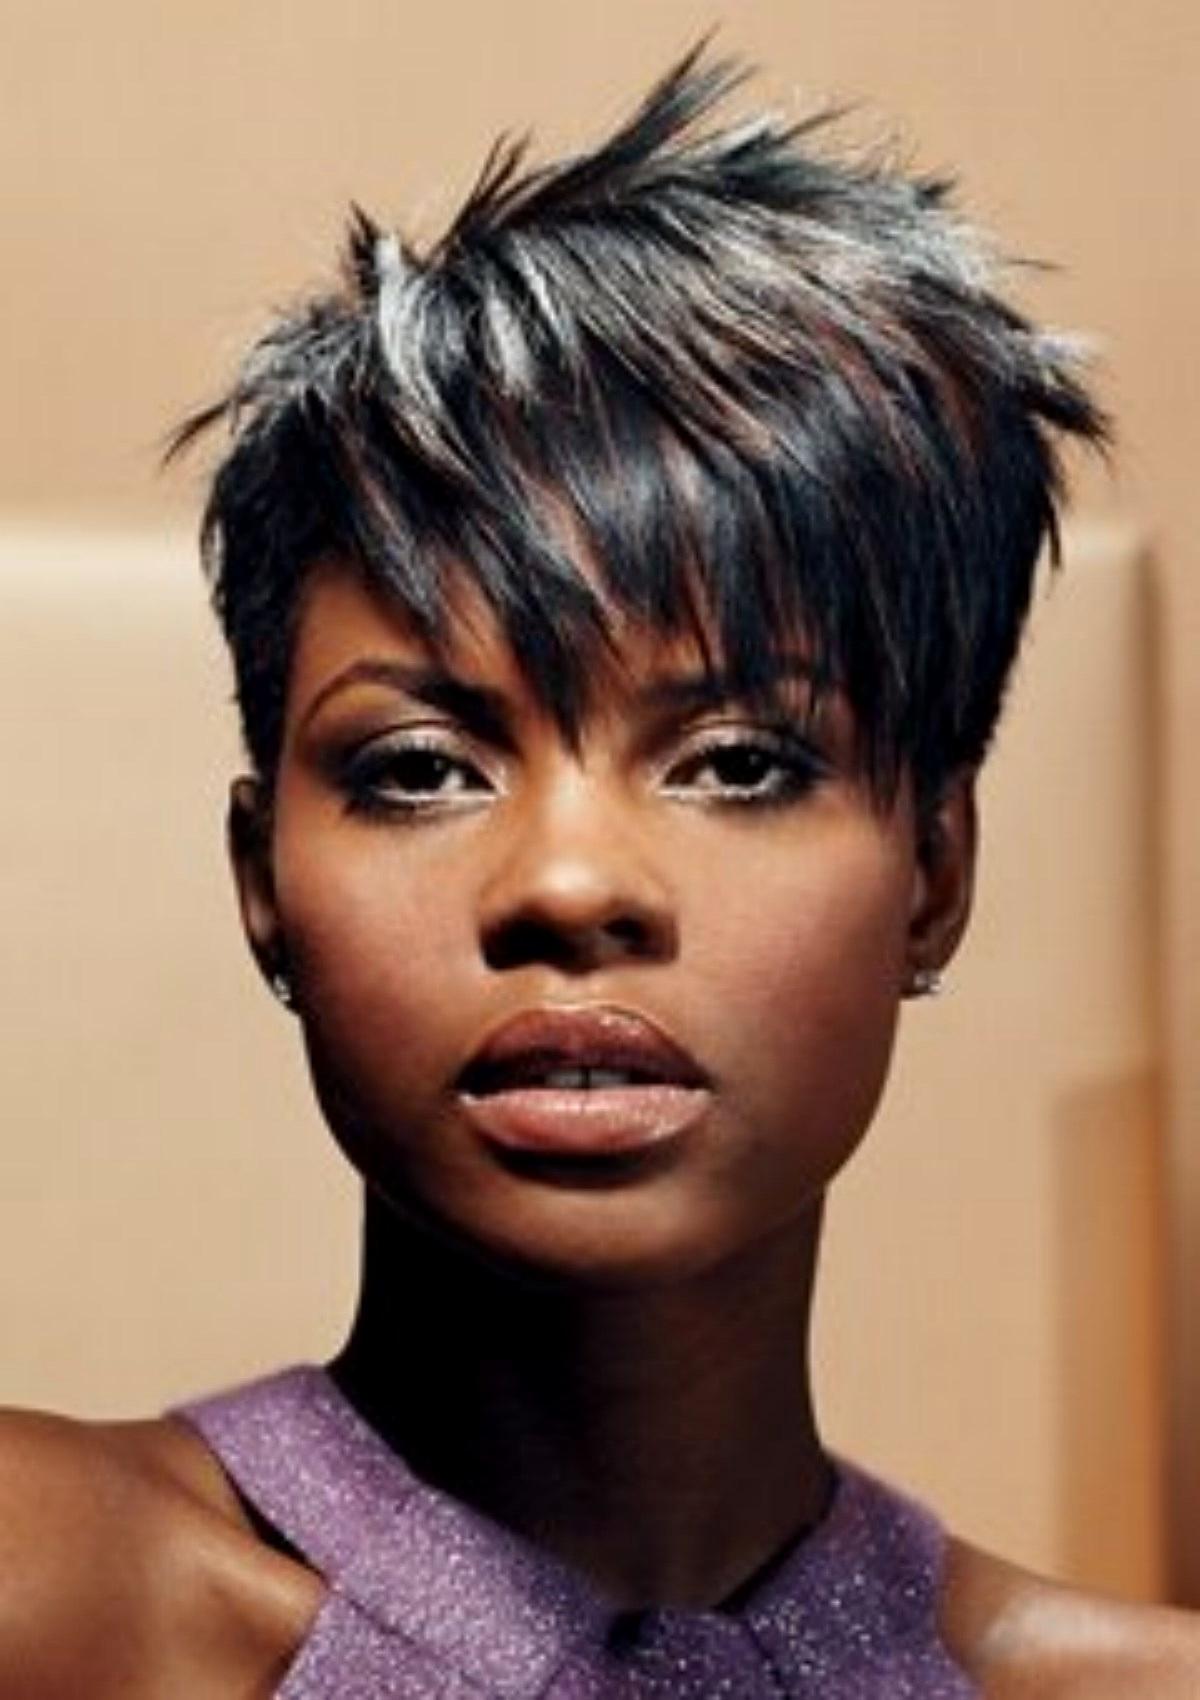 Black African American Short Hairstyles Black Short Haircuts With African Women Short Hairstyles (View 25 of 25)